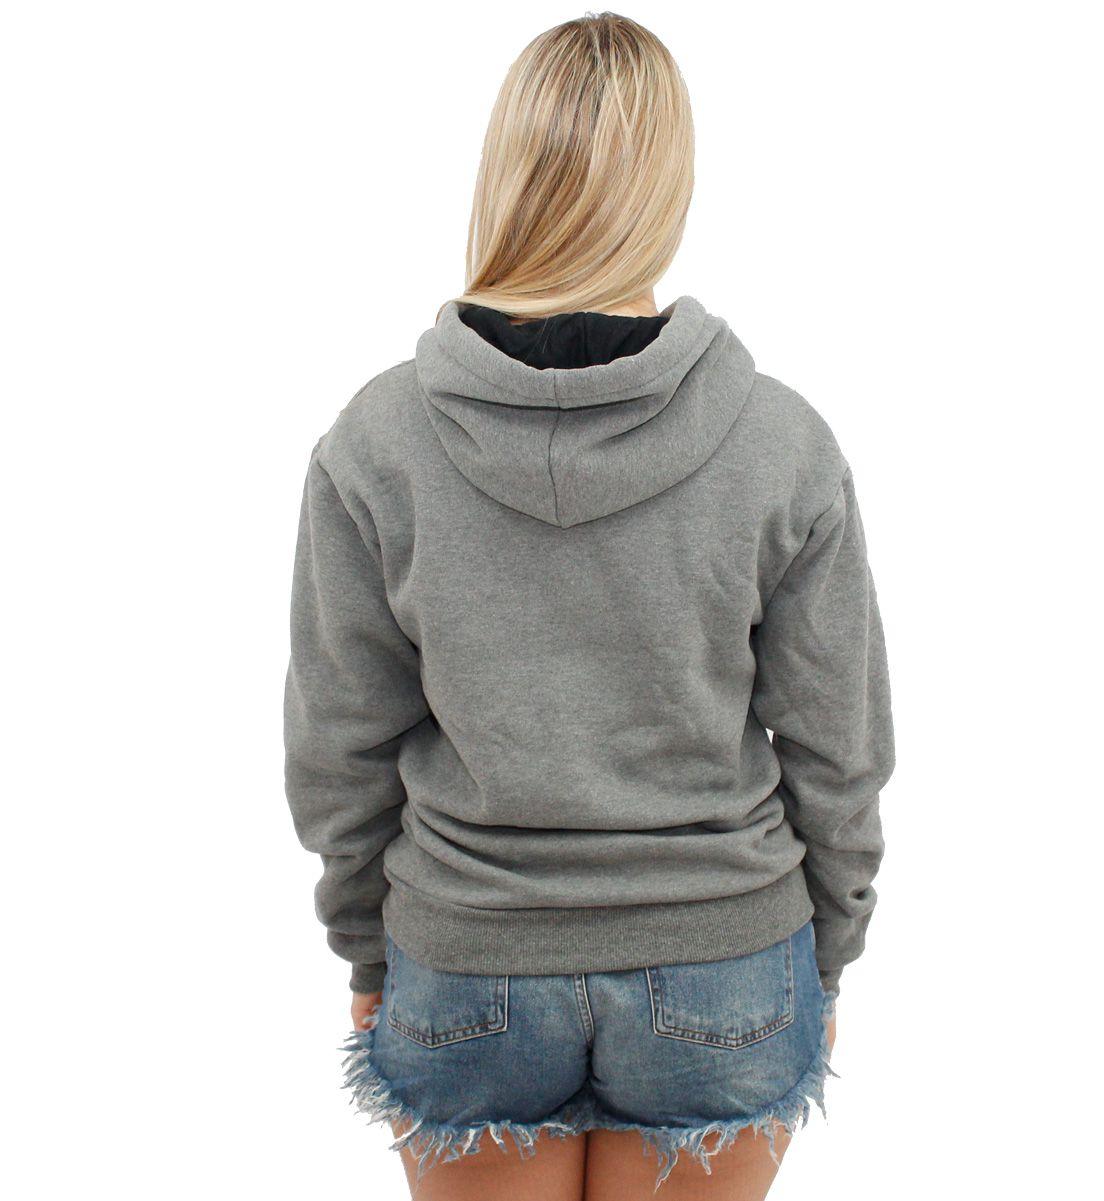 Moletom Feminino Canguru Premium Betty Boop ER_160